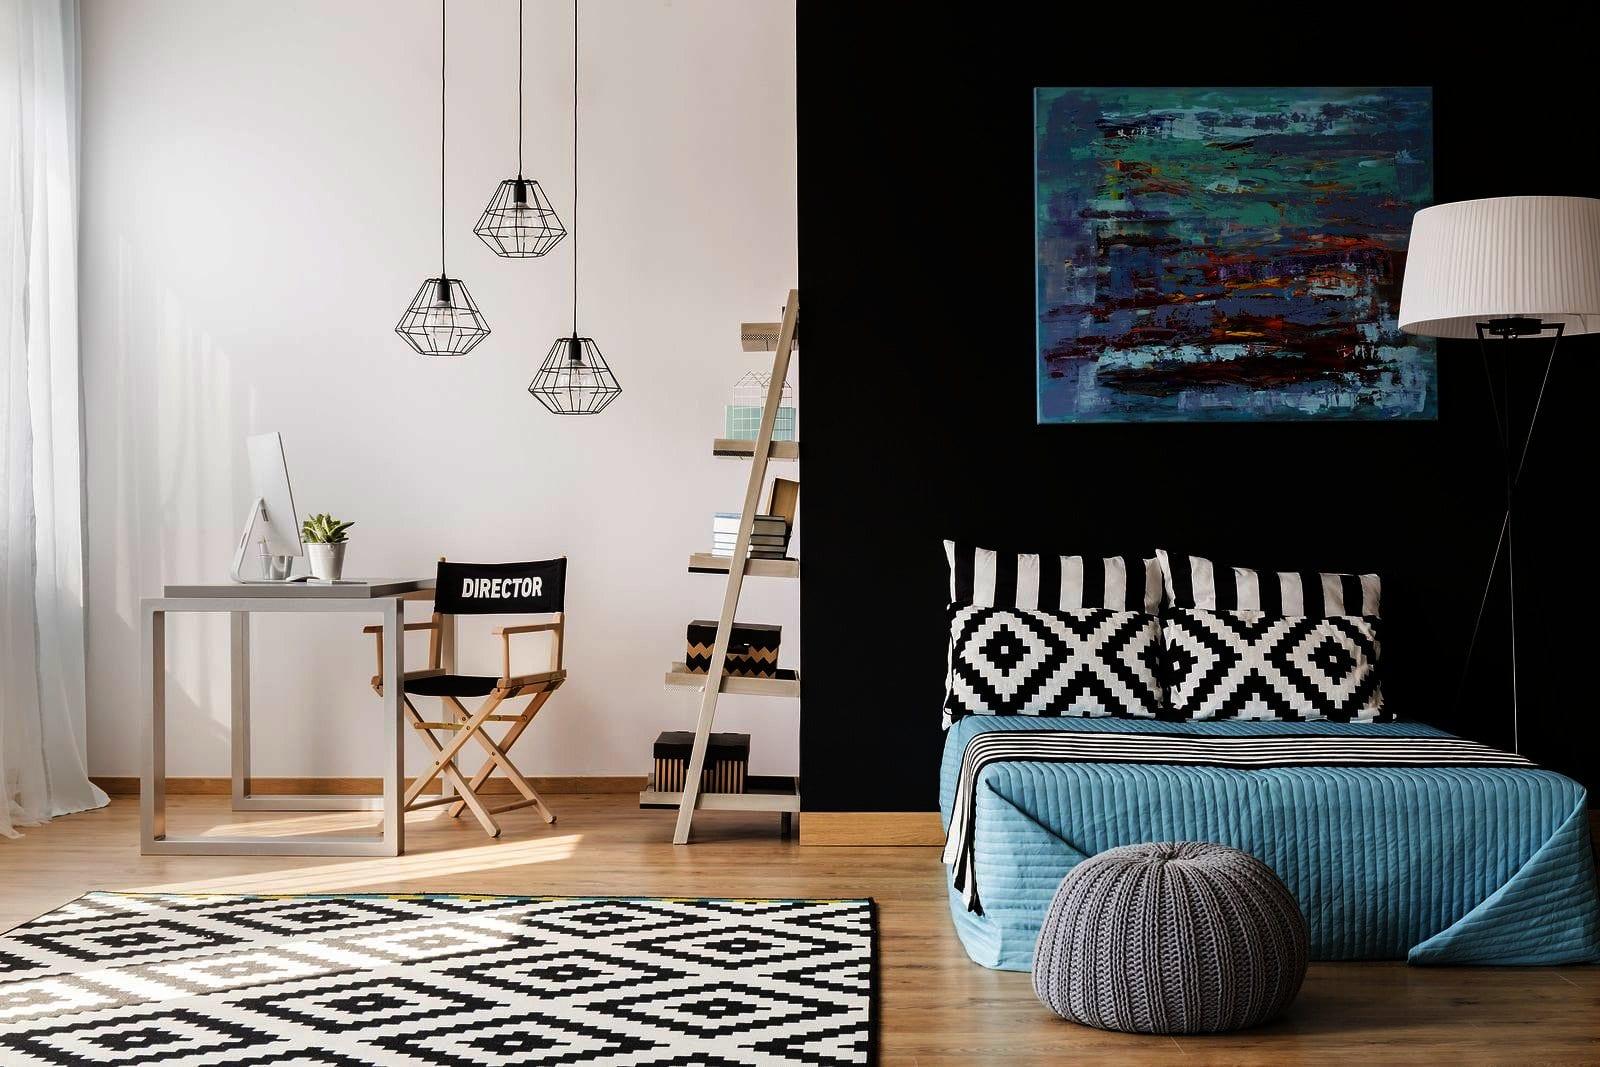 How to Have a Profitable Studio Apartment for Rent? | Mashvisor